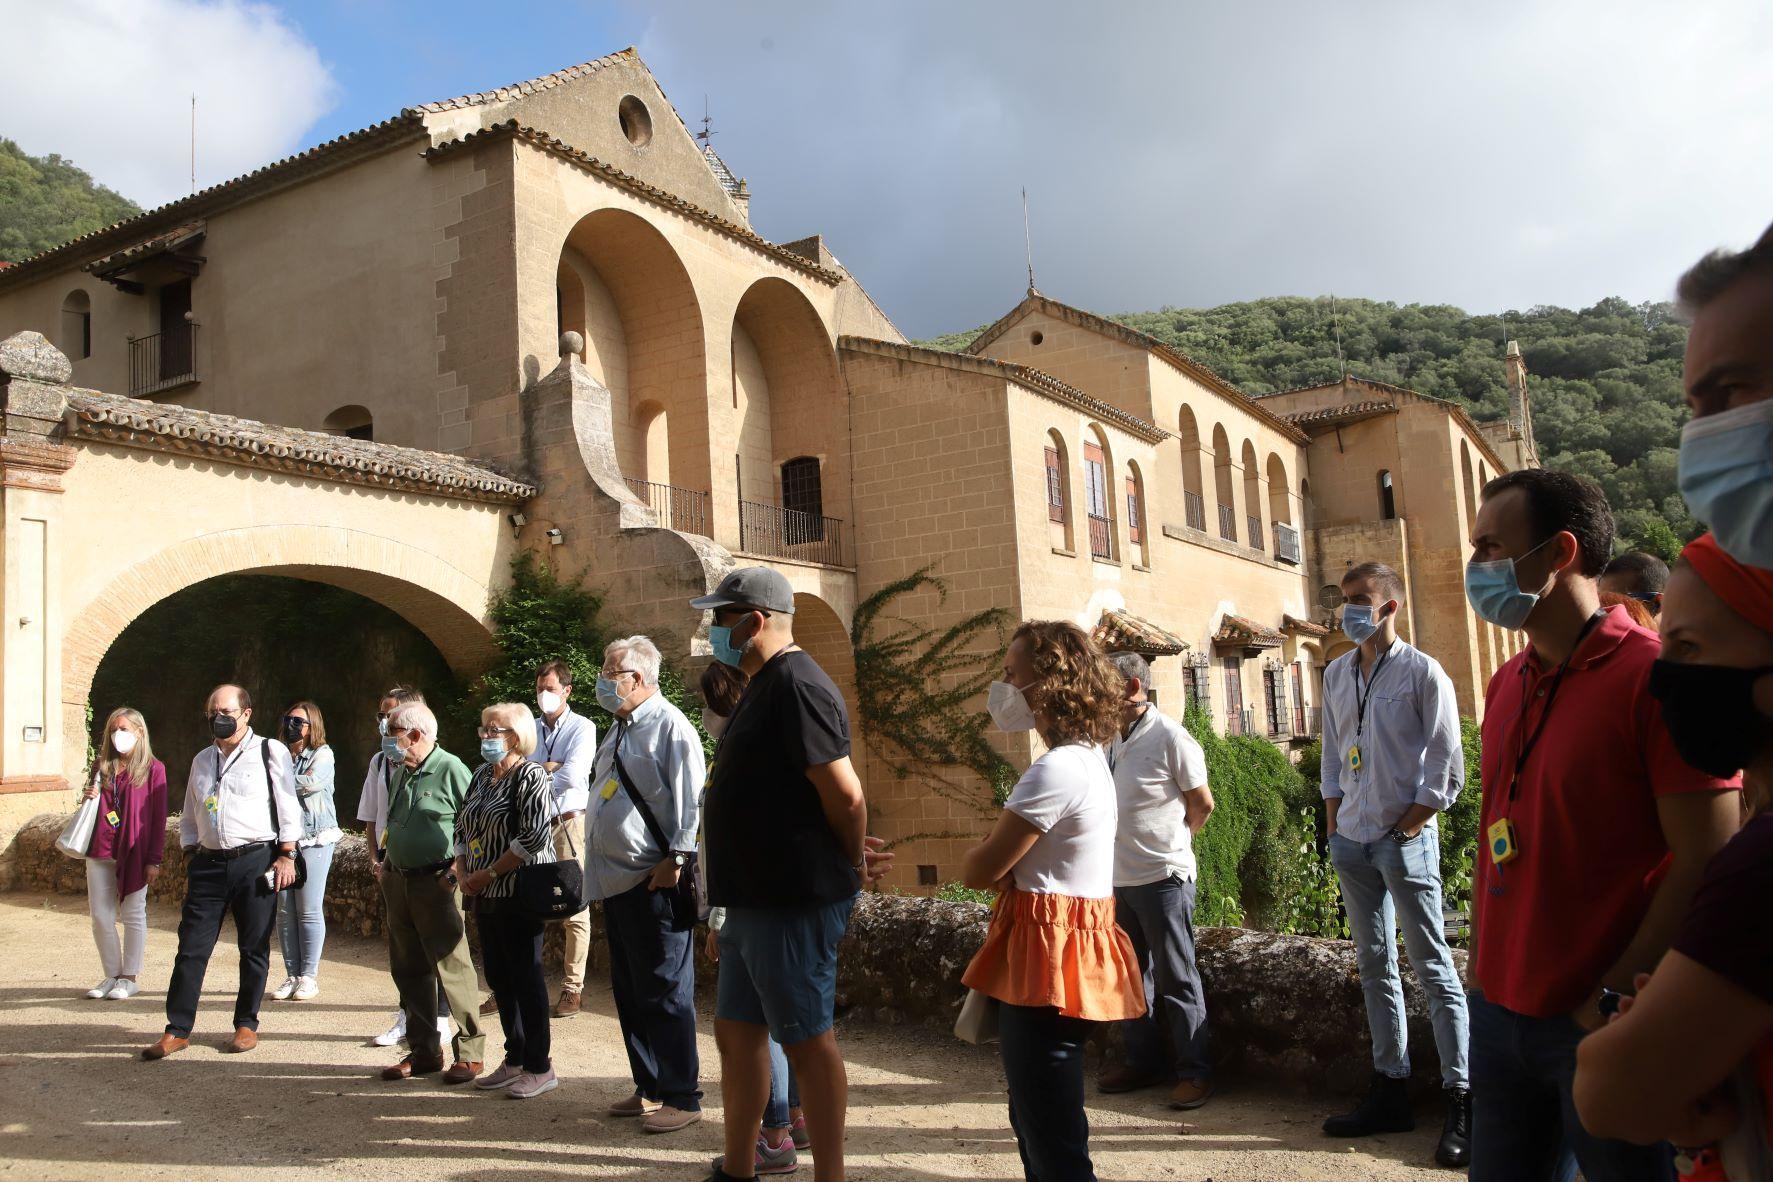 El monasterio de San Jerónimo de Valparaiso vuelve a recibir visitas guiadas